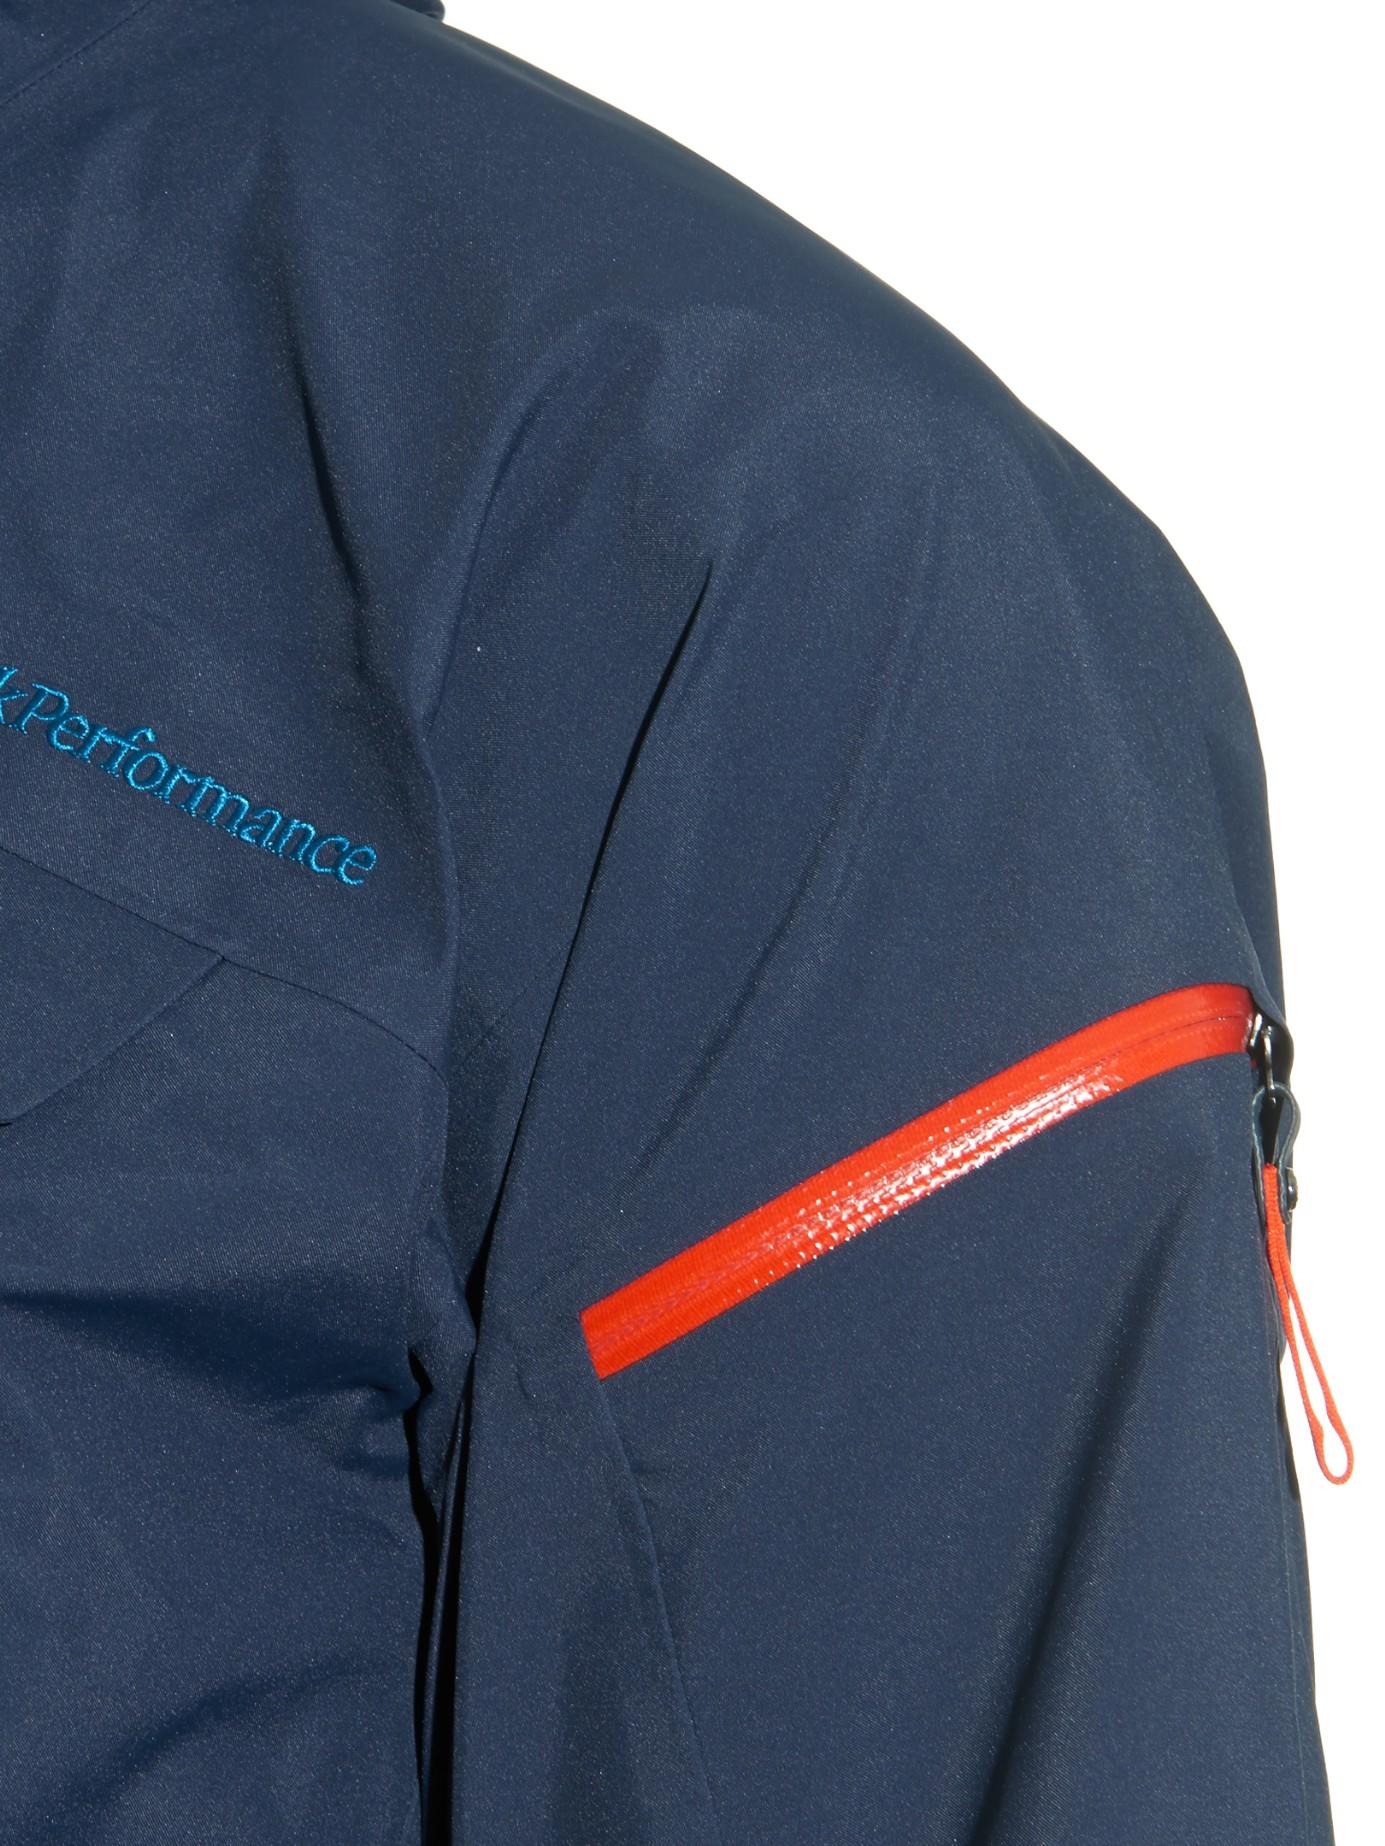 best service 0241d 816bc Peak Performance Blue Heli Alpine Technical Ski Jacket for men